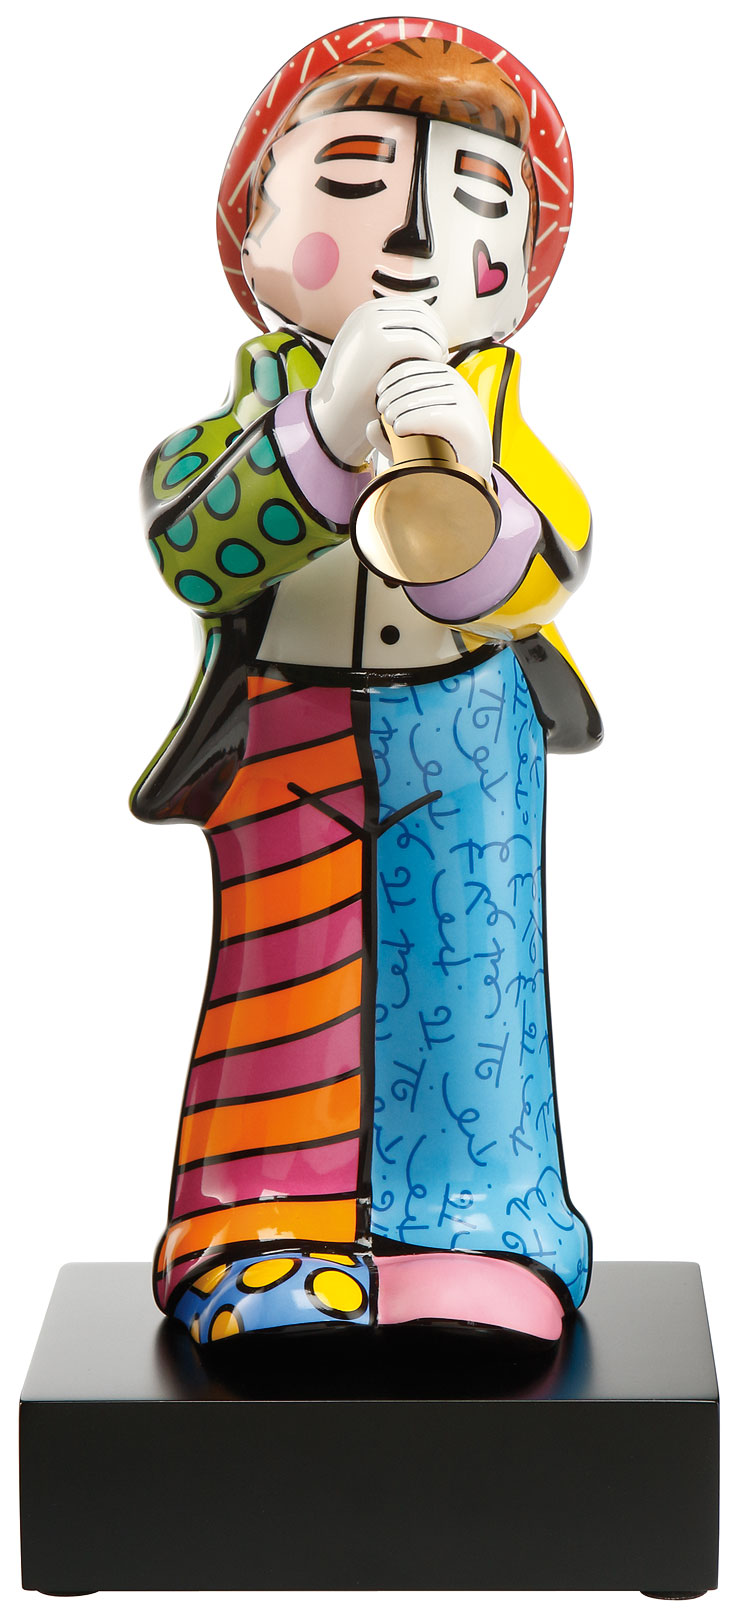 "Porzellanskulptur ""Trompeter"", große Version"